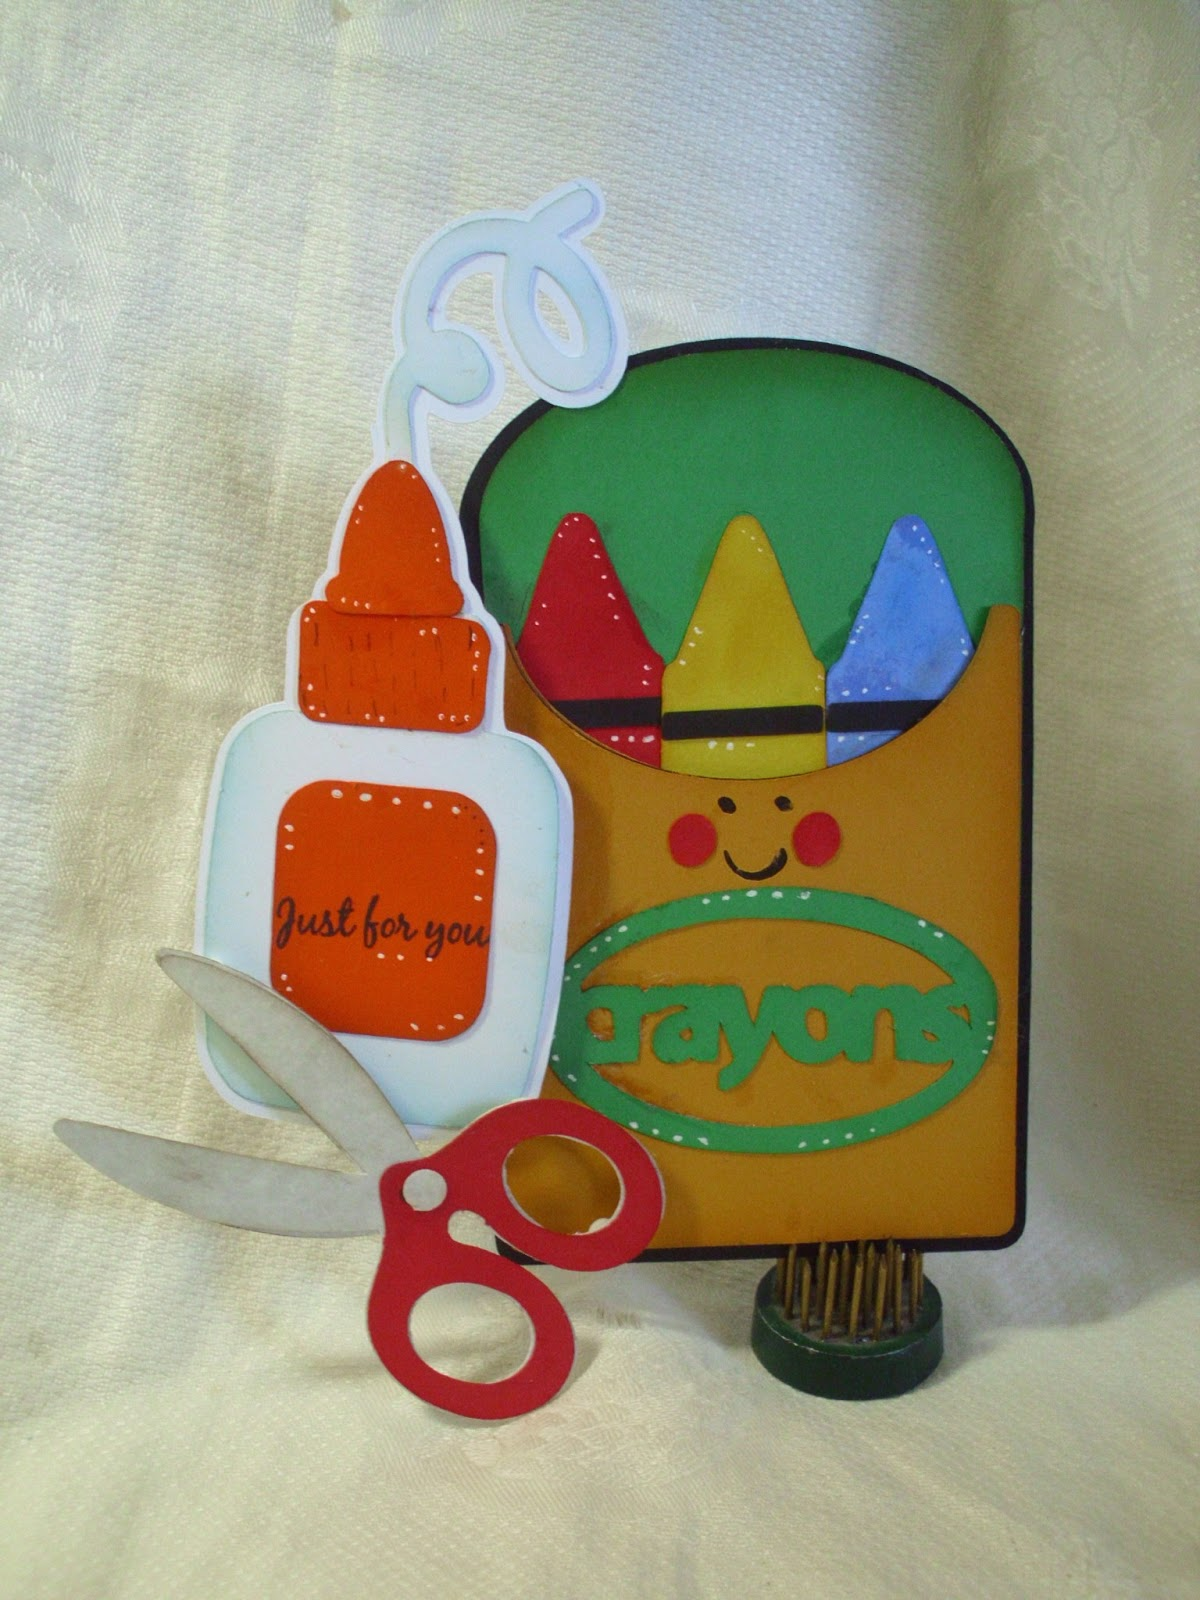 Shellys Craft Blog: Back To School In My Cricut Craftroom